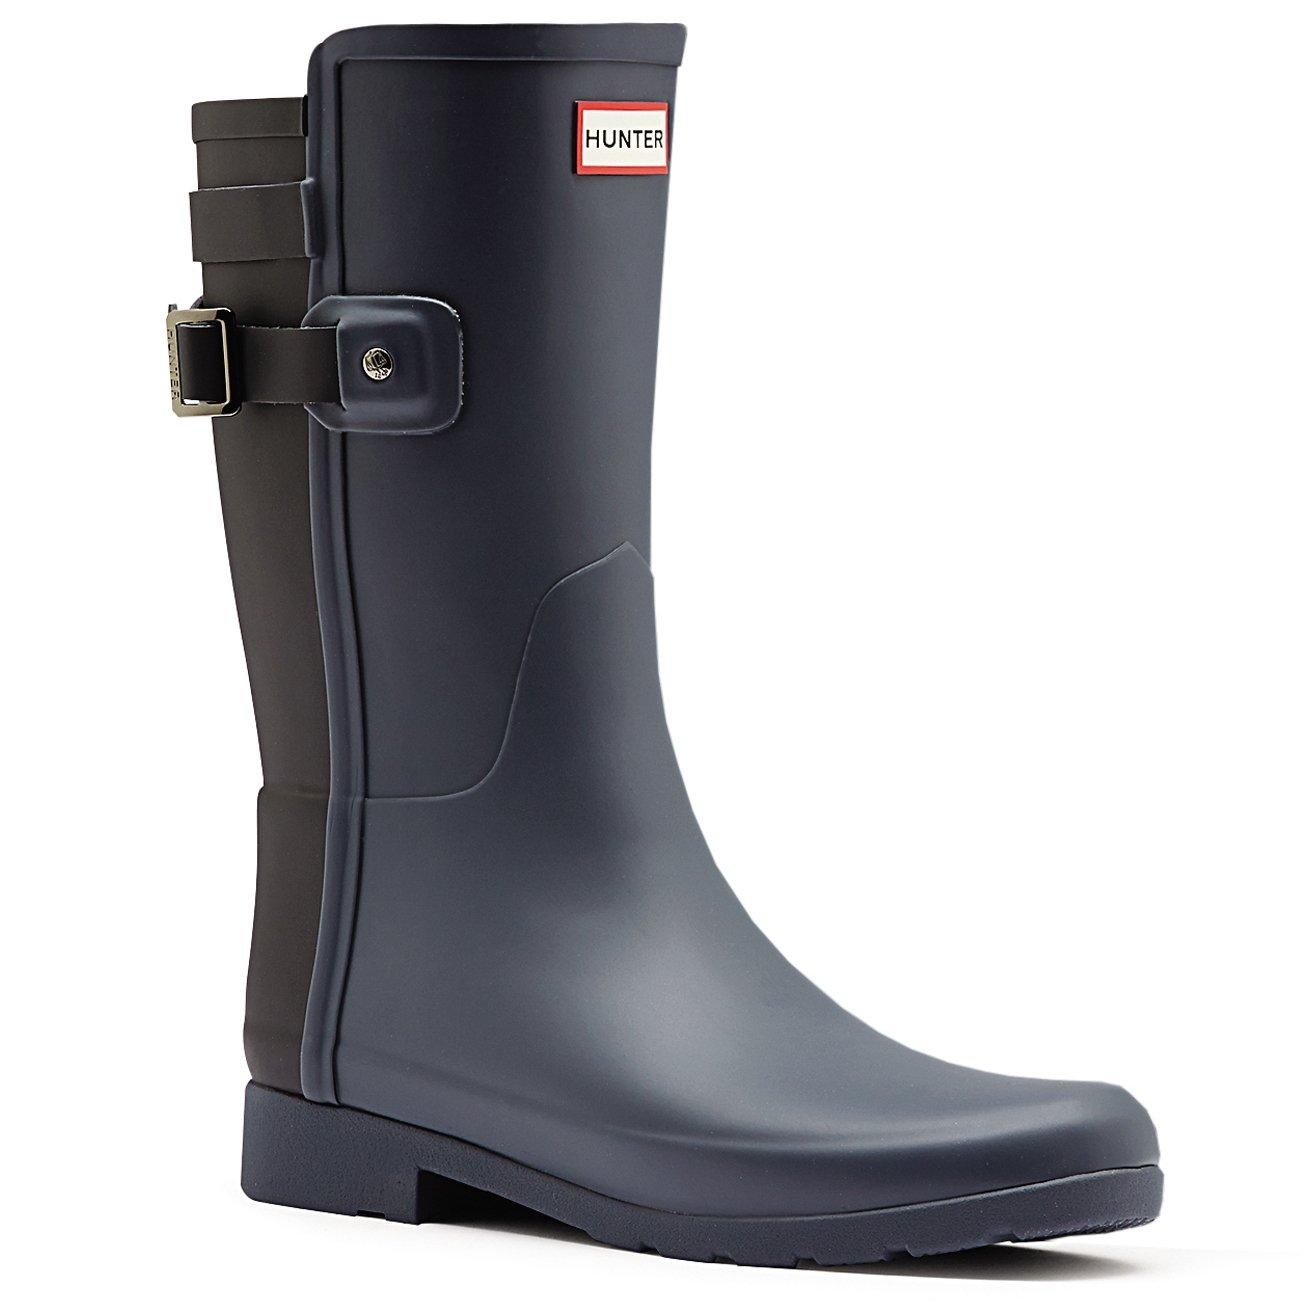 Womens Hunter Original Refined Back Strap Short Wellingtons Rain Boots B01JOTQYYS 9 B(M) US|Dark Slate/Black